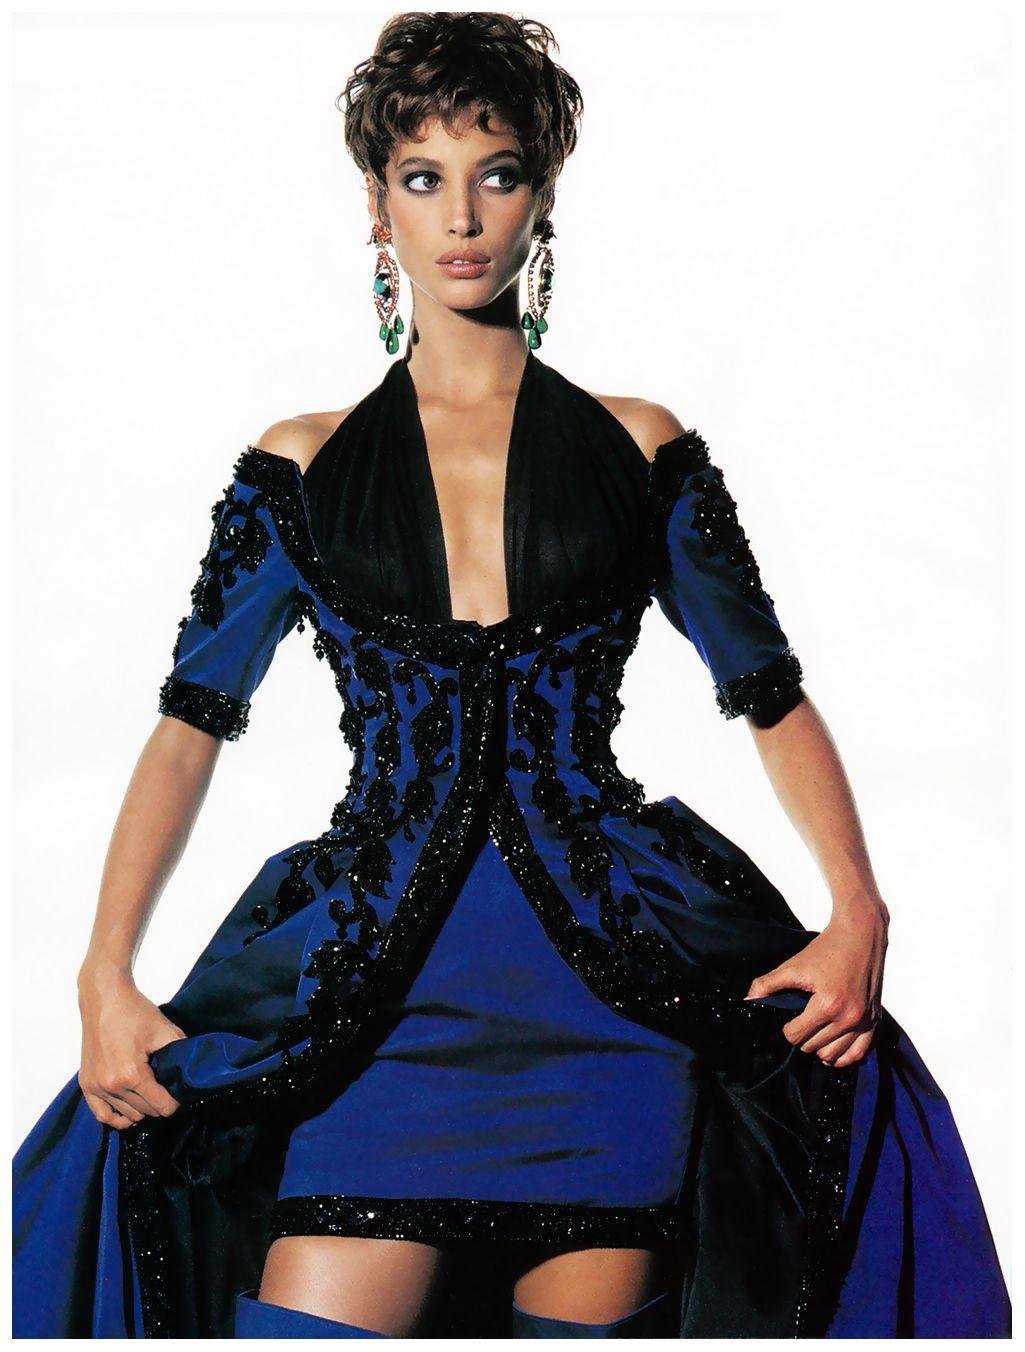 Christy Turlington In Chanel VOGUE, 1990